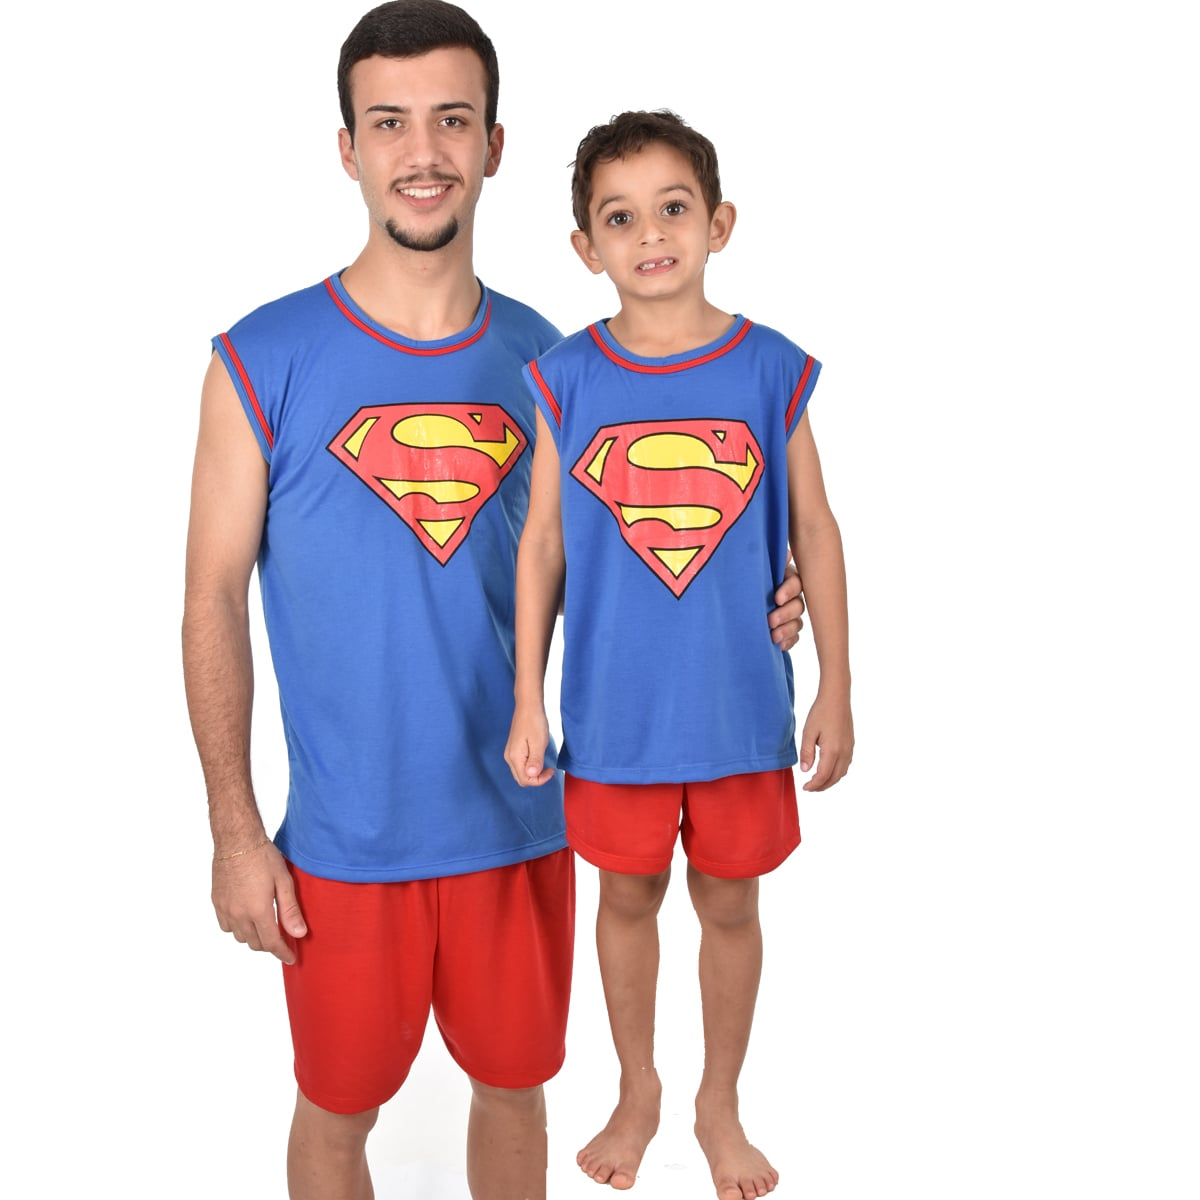 Pijama Regata Short Masculino Adulto Superman Super Homem Liga da Justiça Ref 355